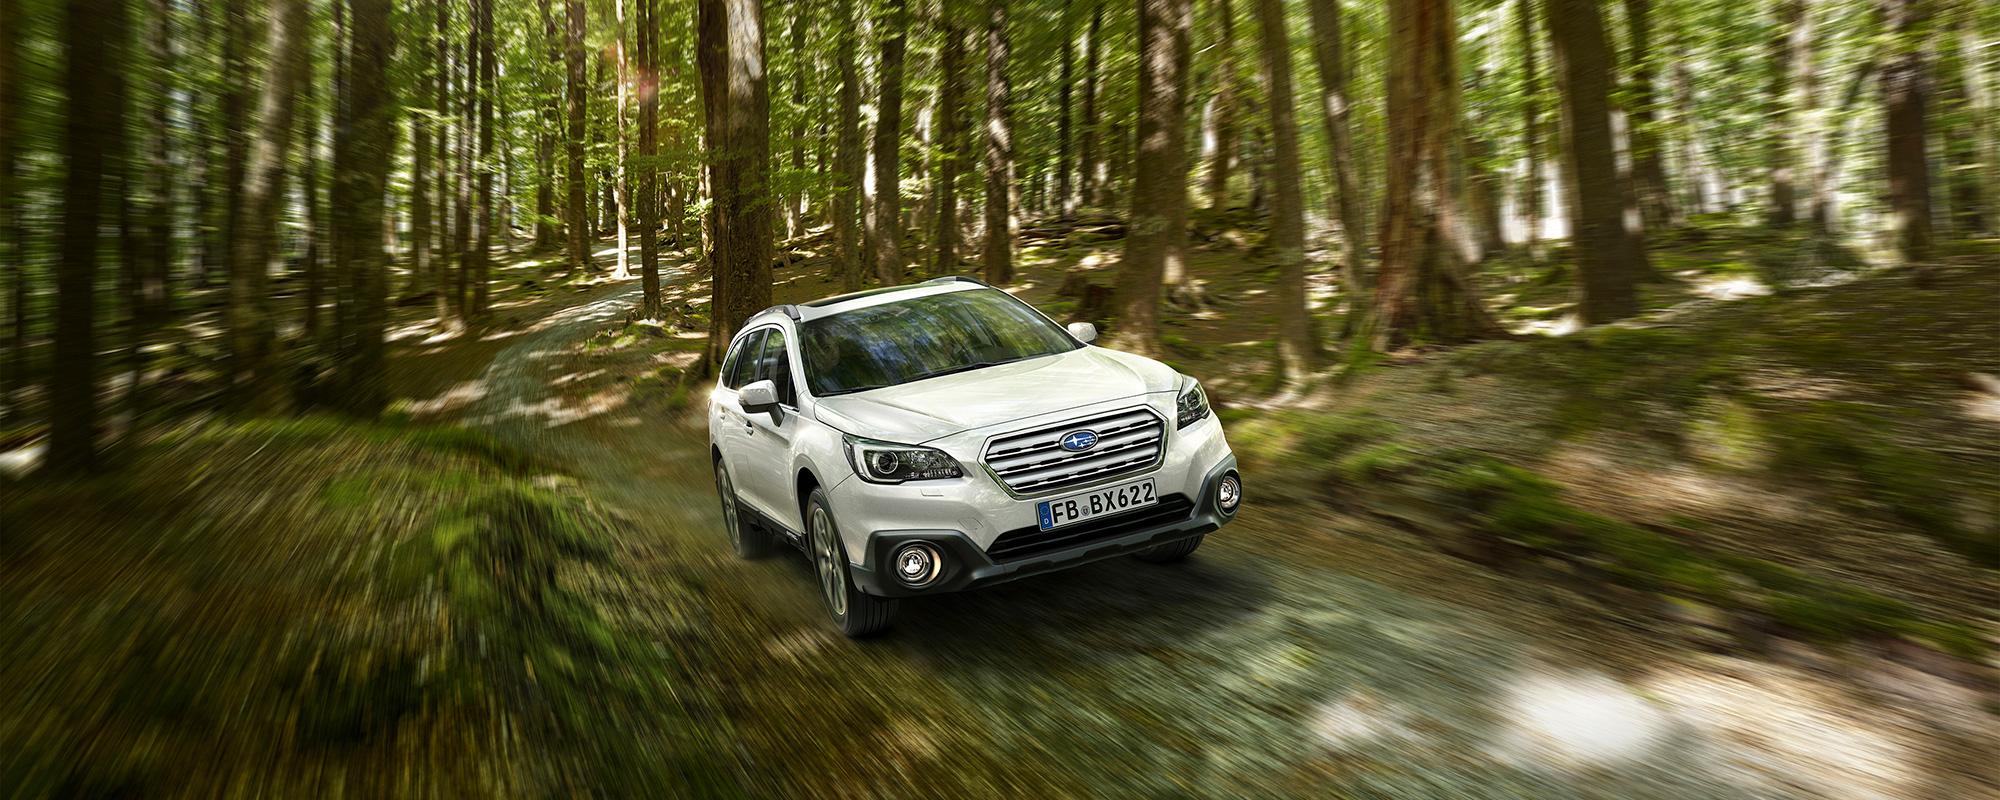 Fahrzeugbestand - Autohaus Dumler - Subaru Wald